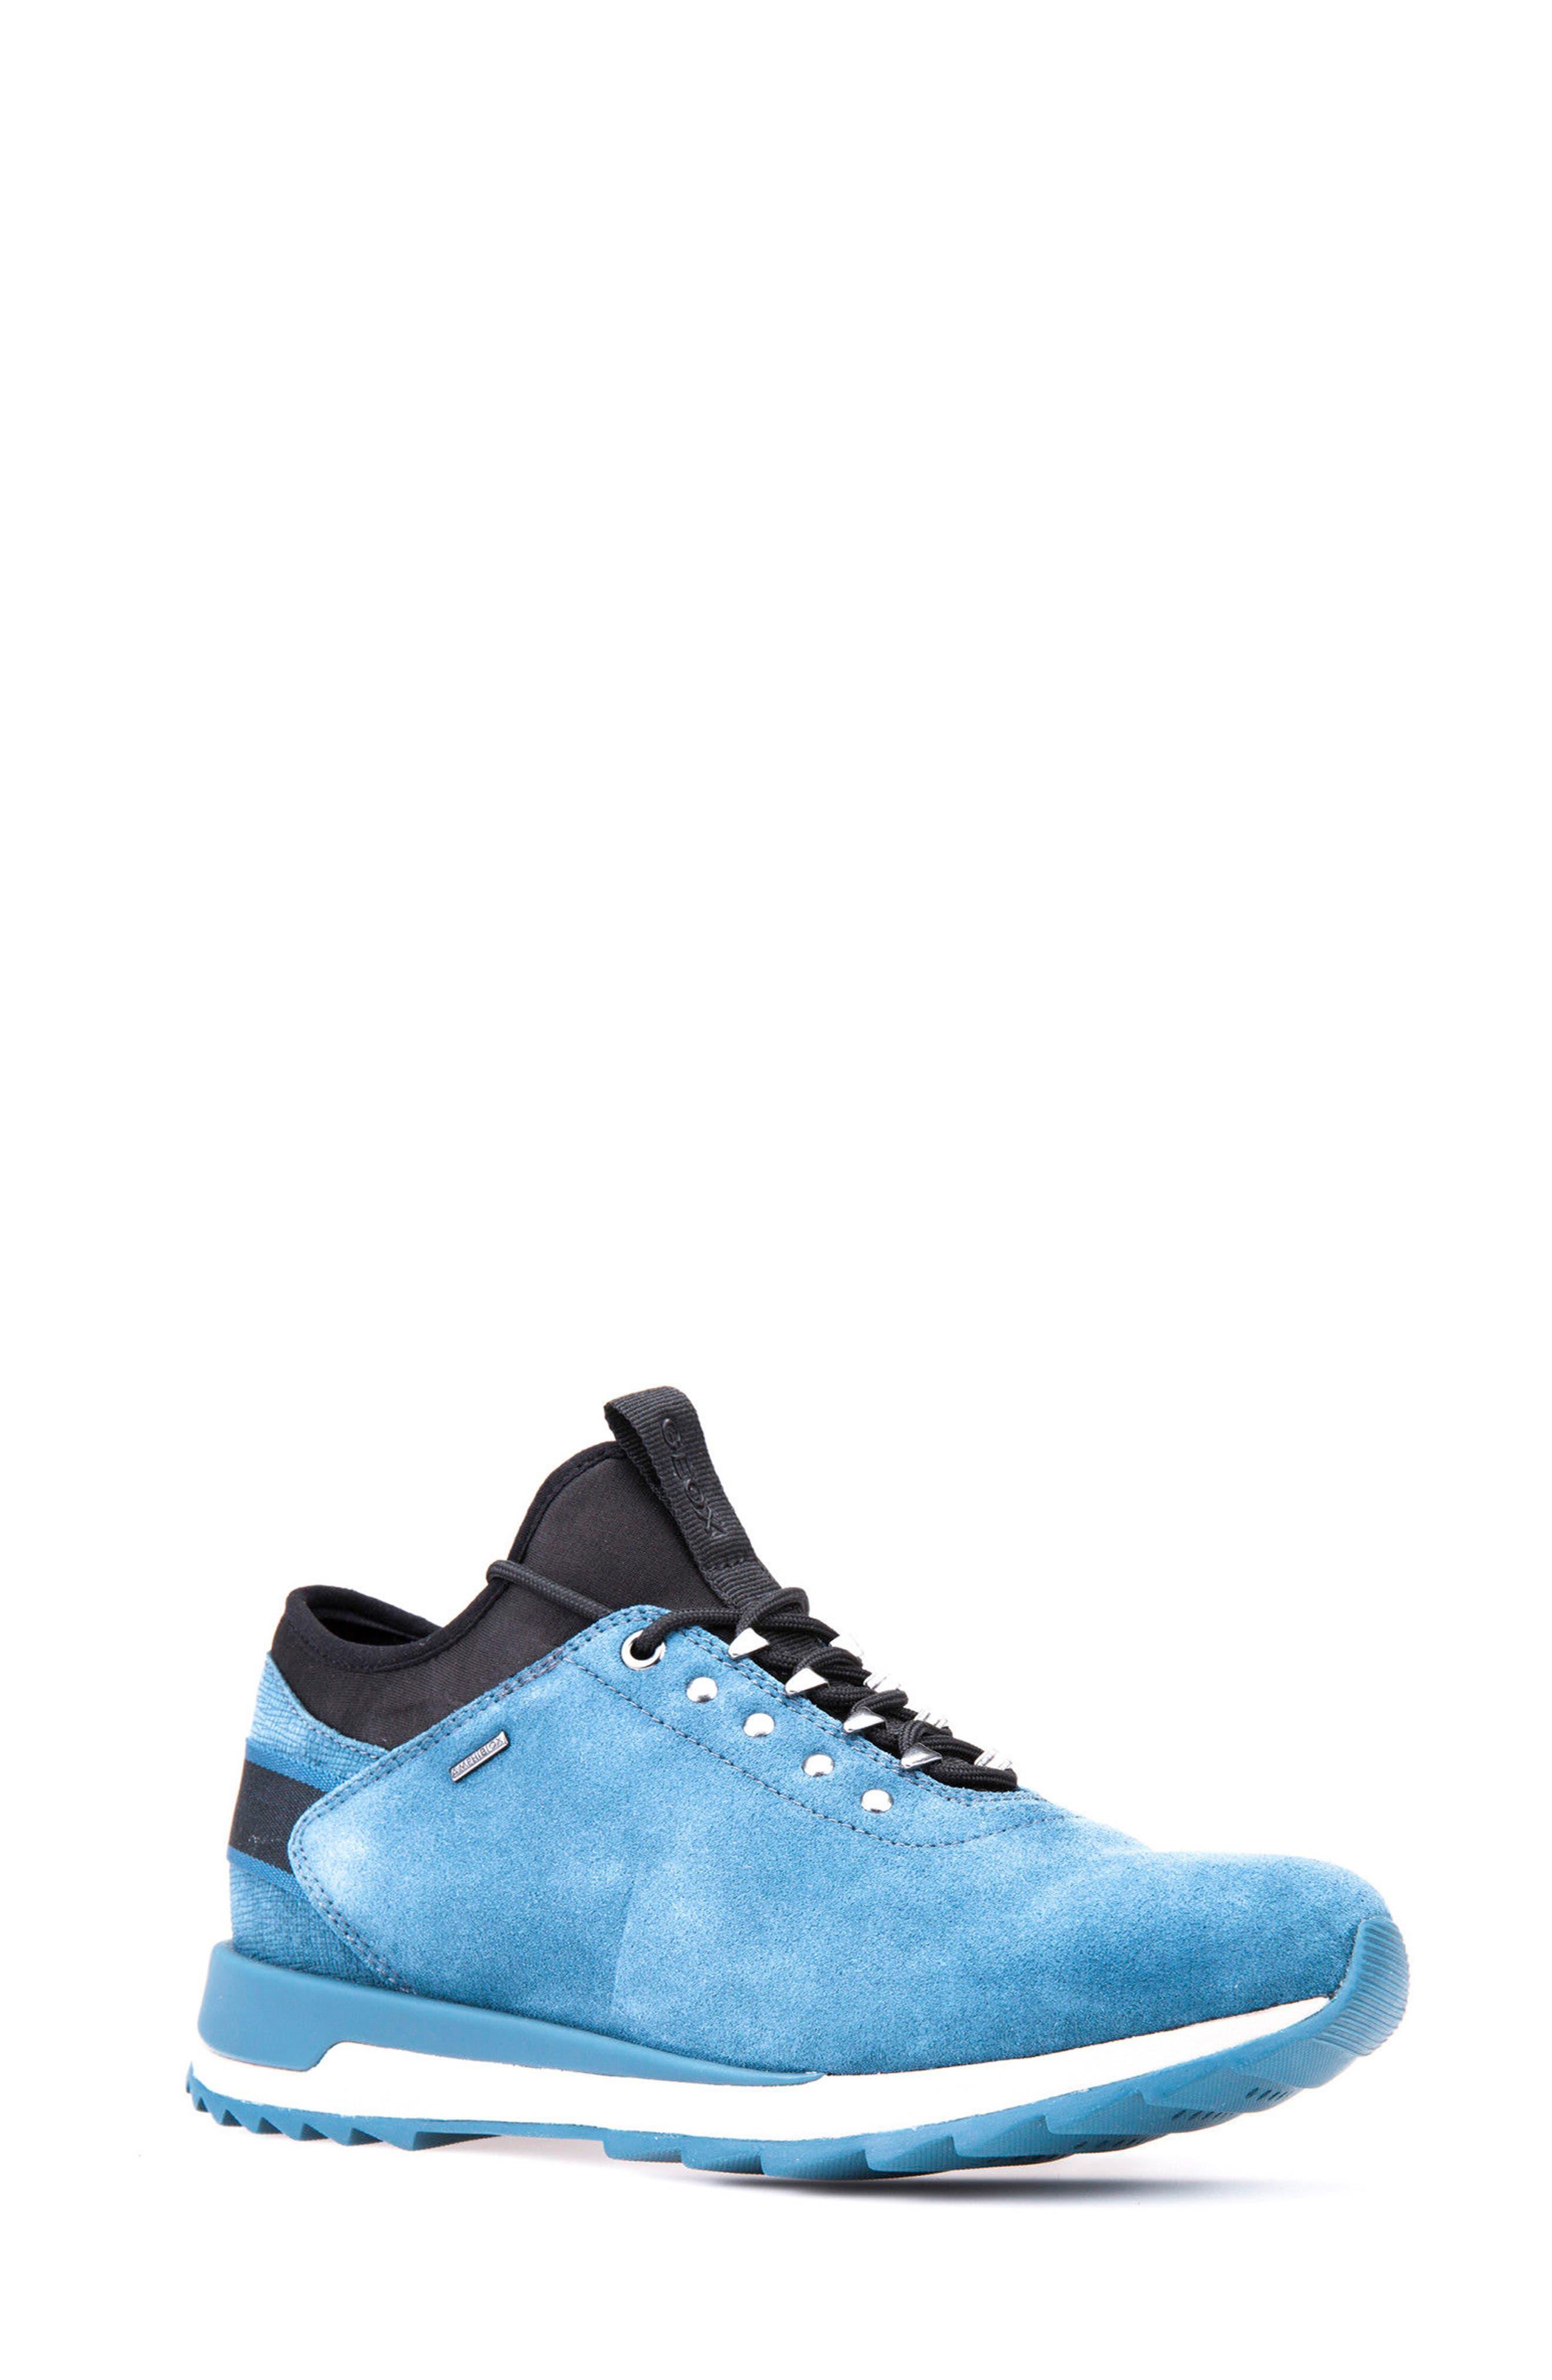 Geox Aneko ABX 2 Sneaker (Women)